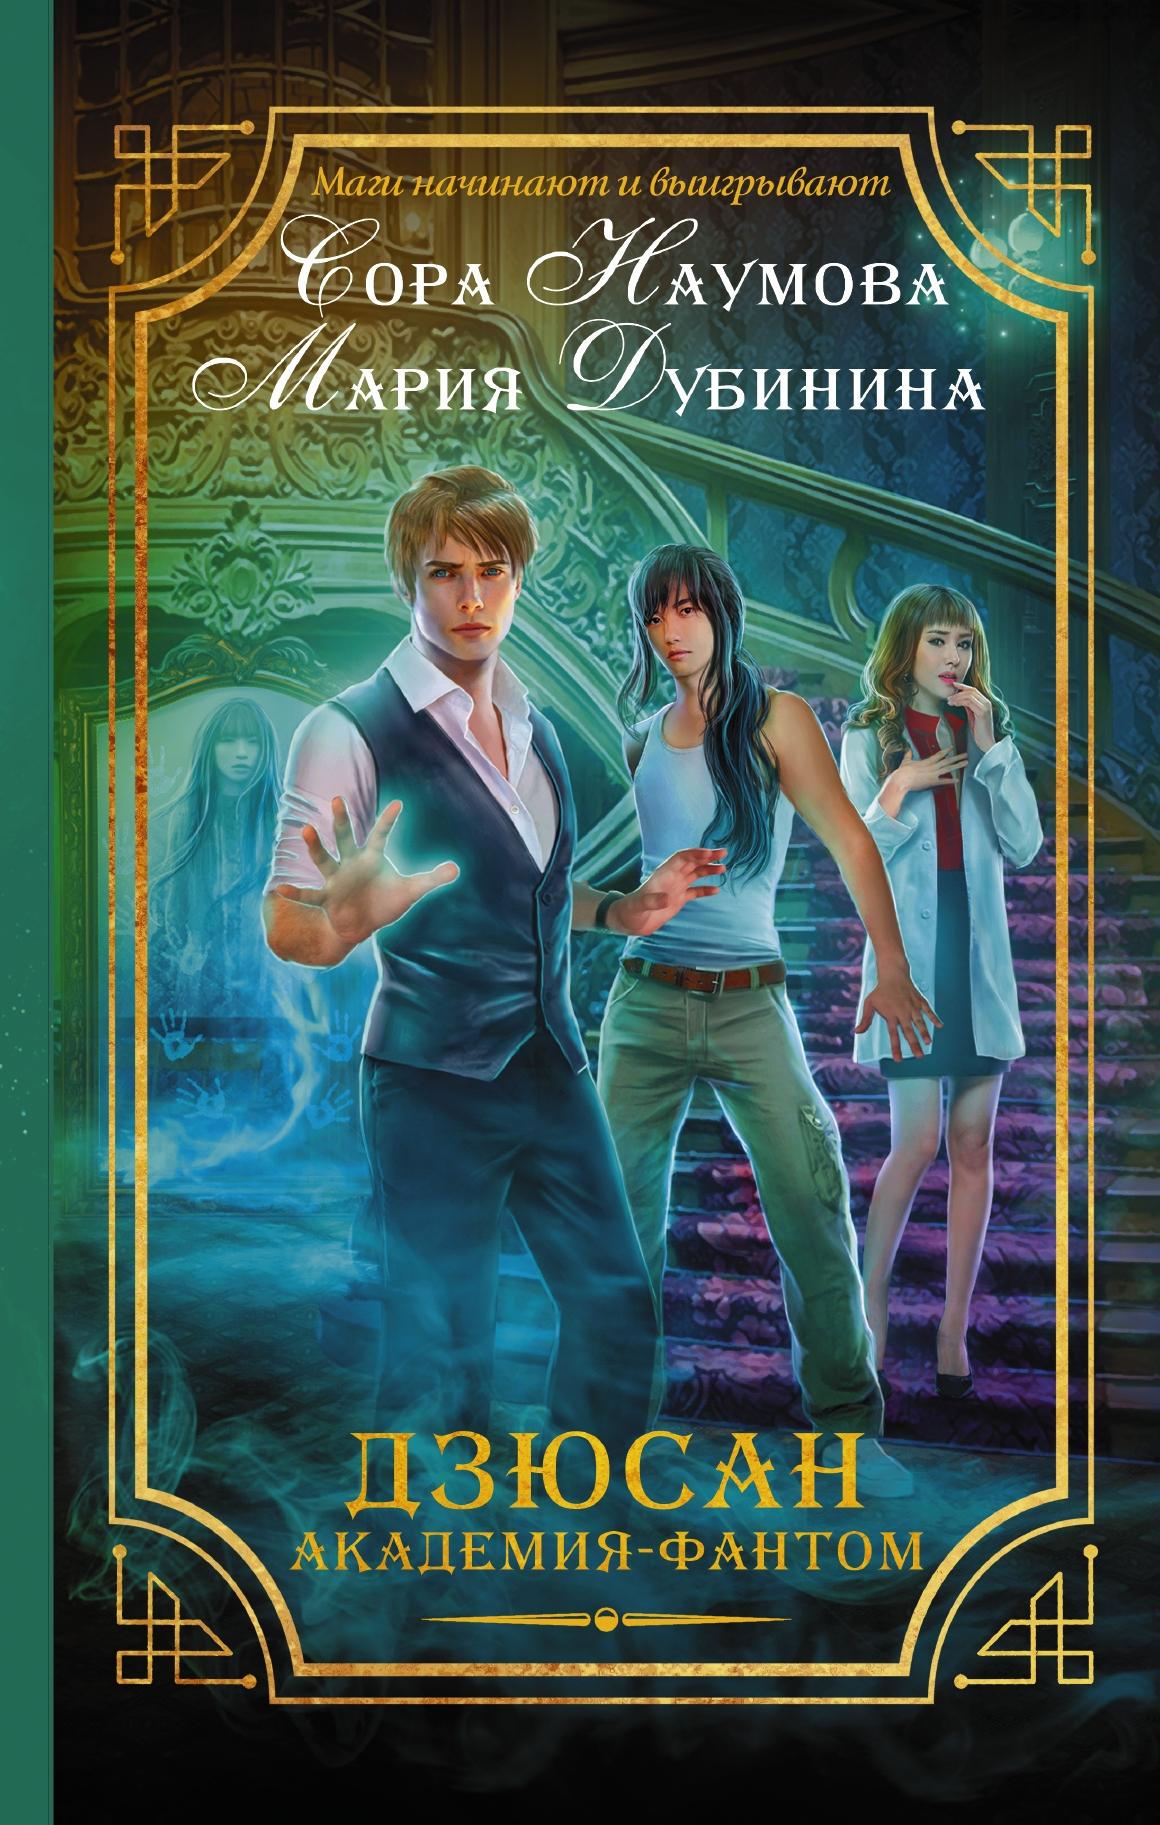 Дзюсан. Академия-фантом - Сора Наумова, Мария Дубинина